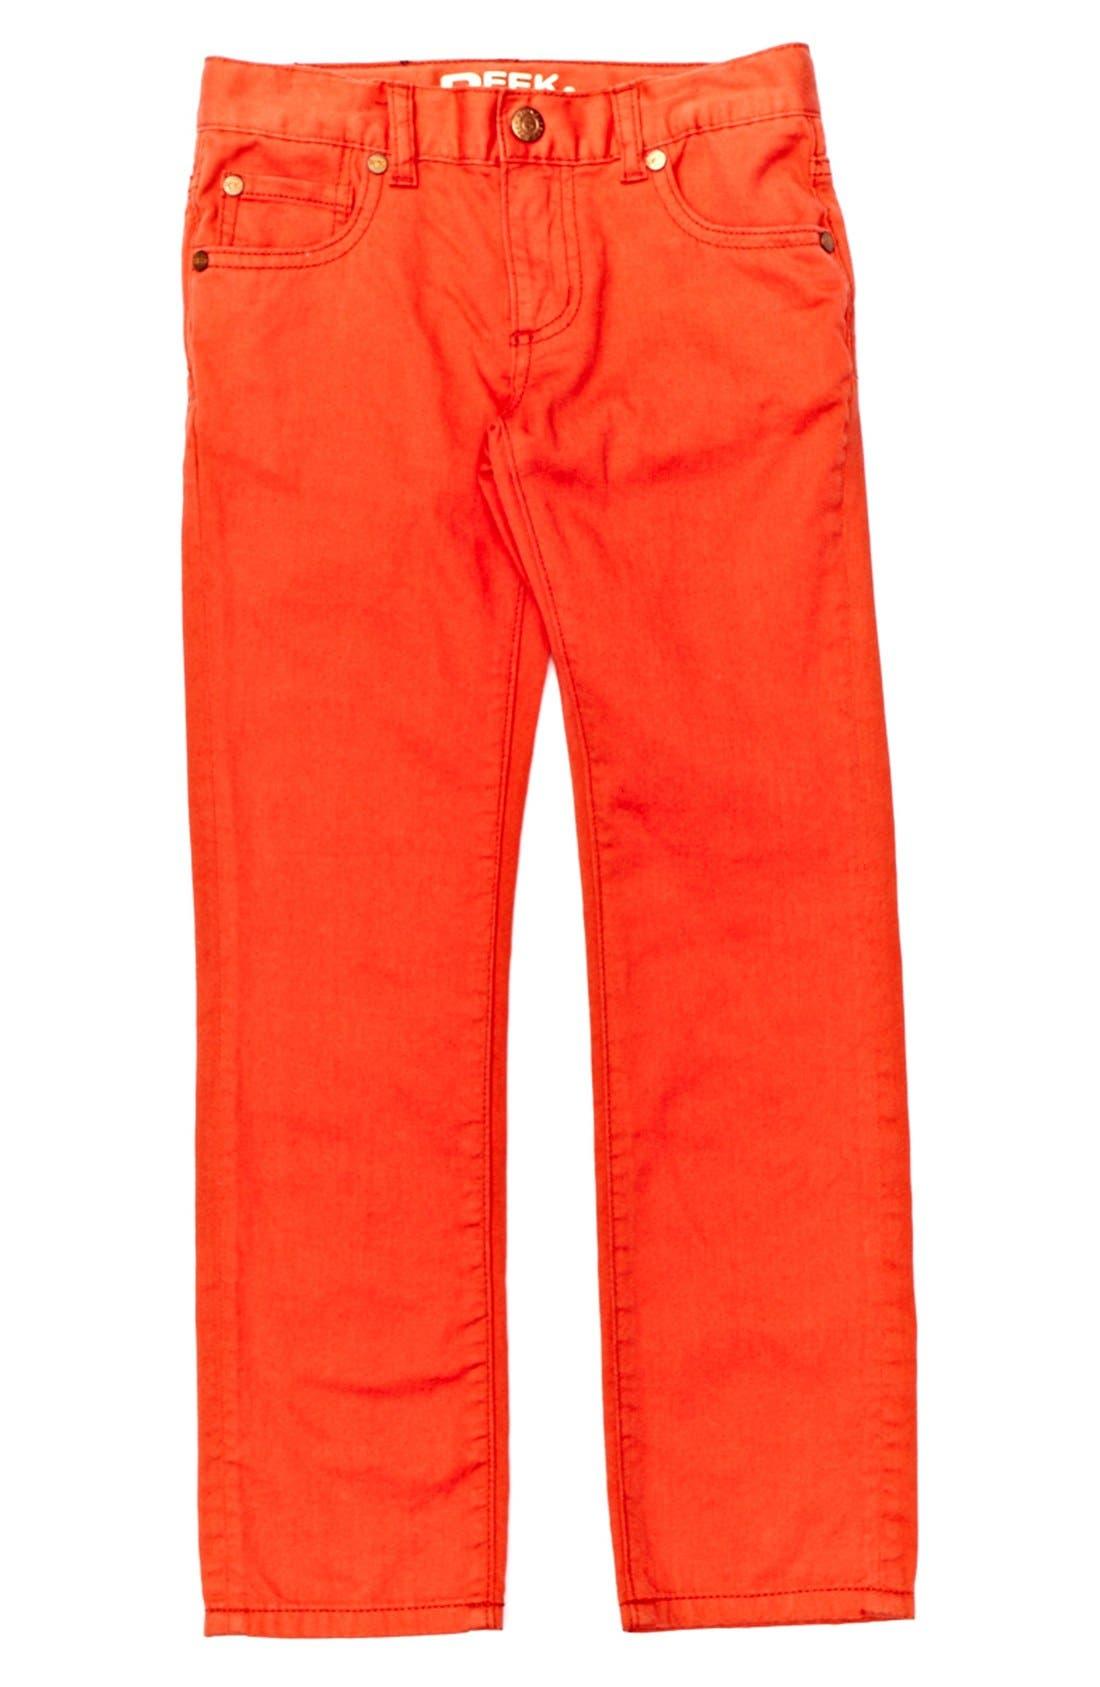 Main Image - Peek 'Slouch' Twill Jeans (Toddler Boys, Little Boys & Big Boys)